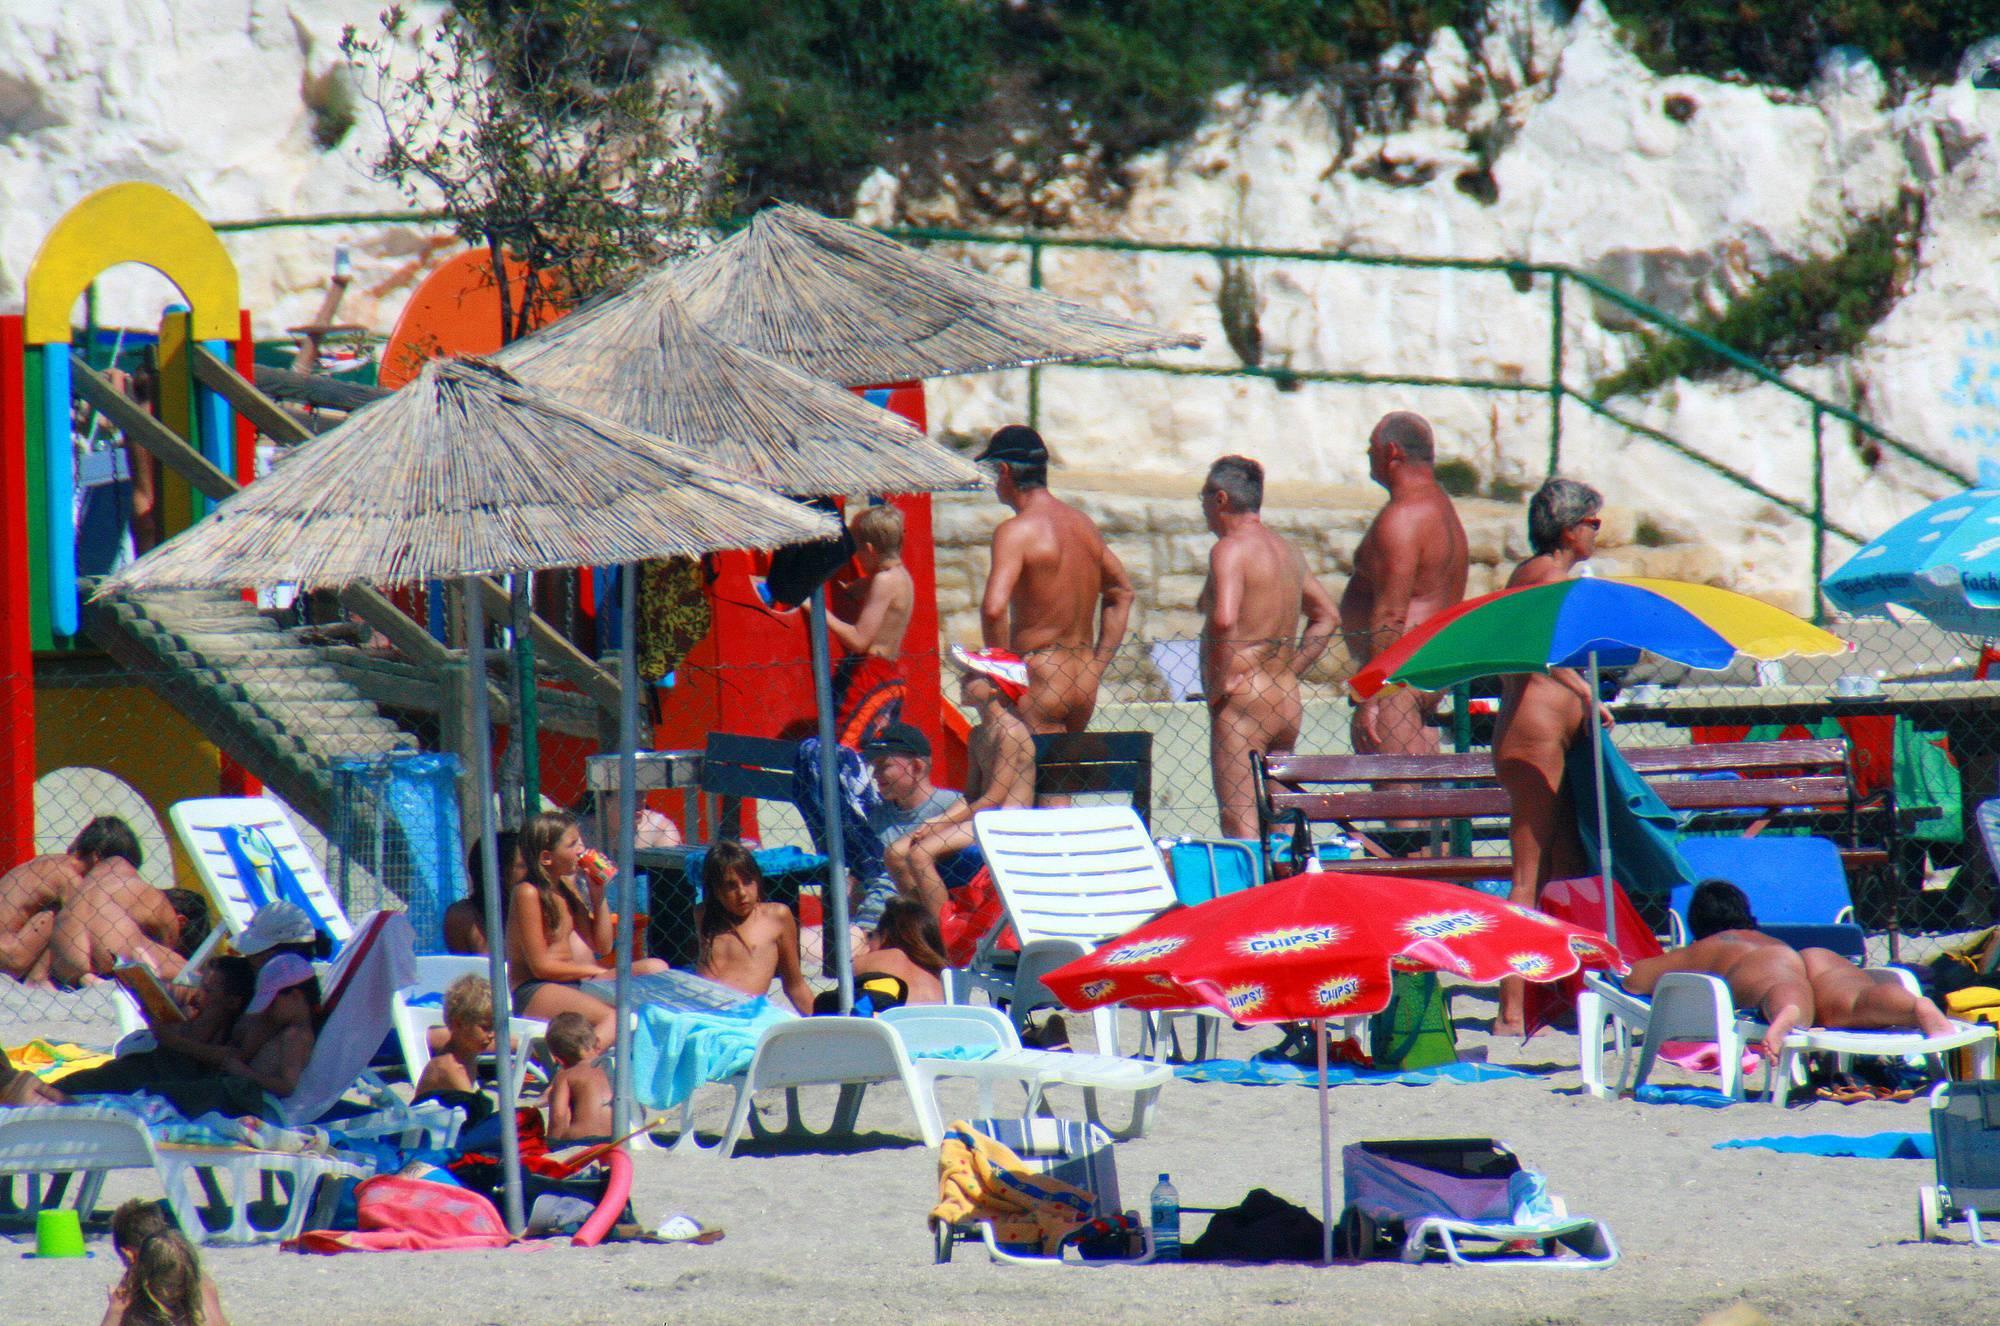 Ula FKK Beach Shorelines - 2